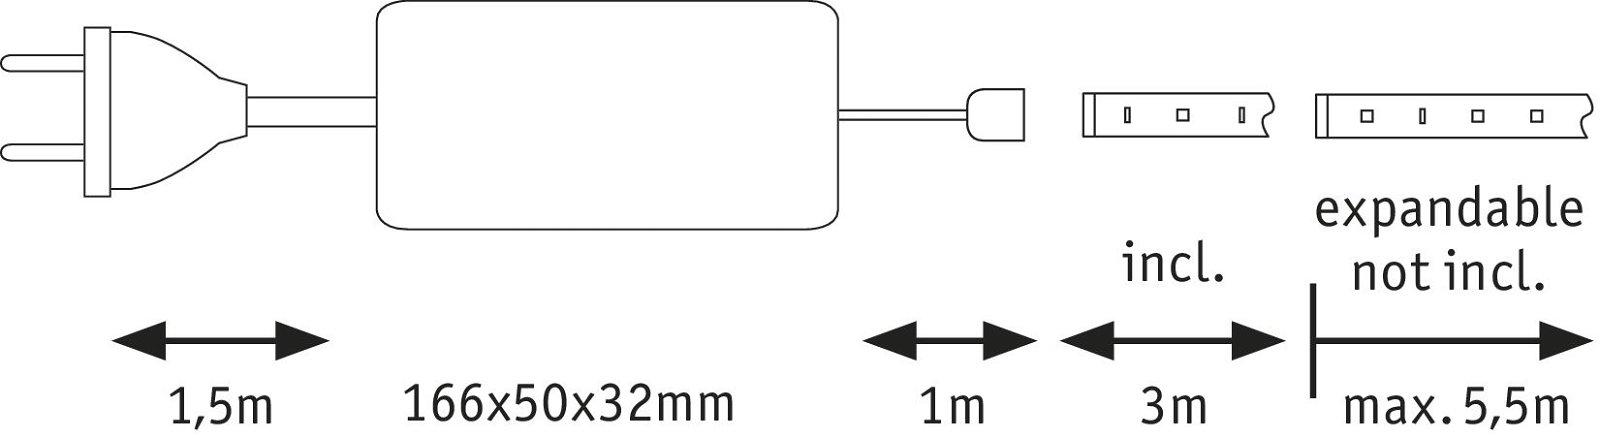 MaxLED 1000 LED Strip Daglichtwit 3m gecoat 35W 3300lm 6500K 40VA